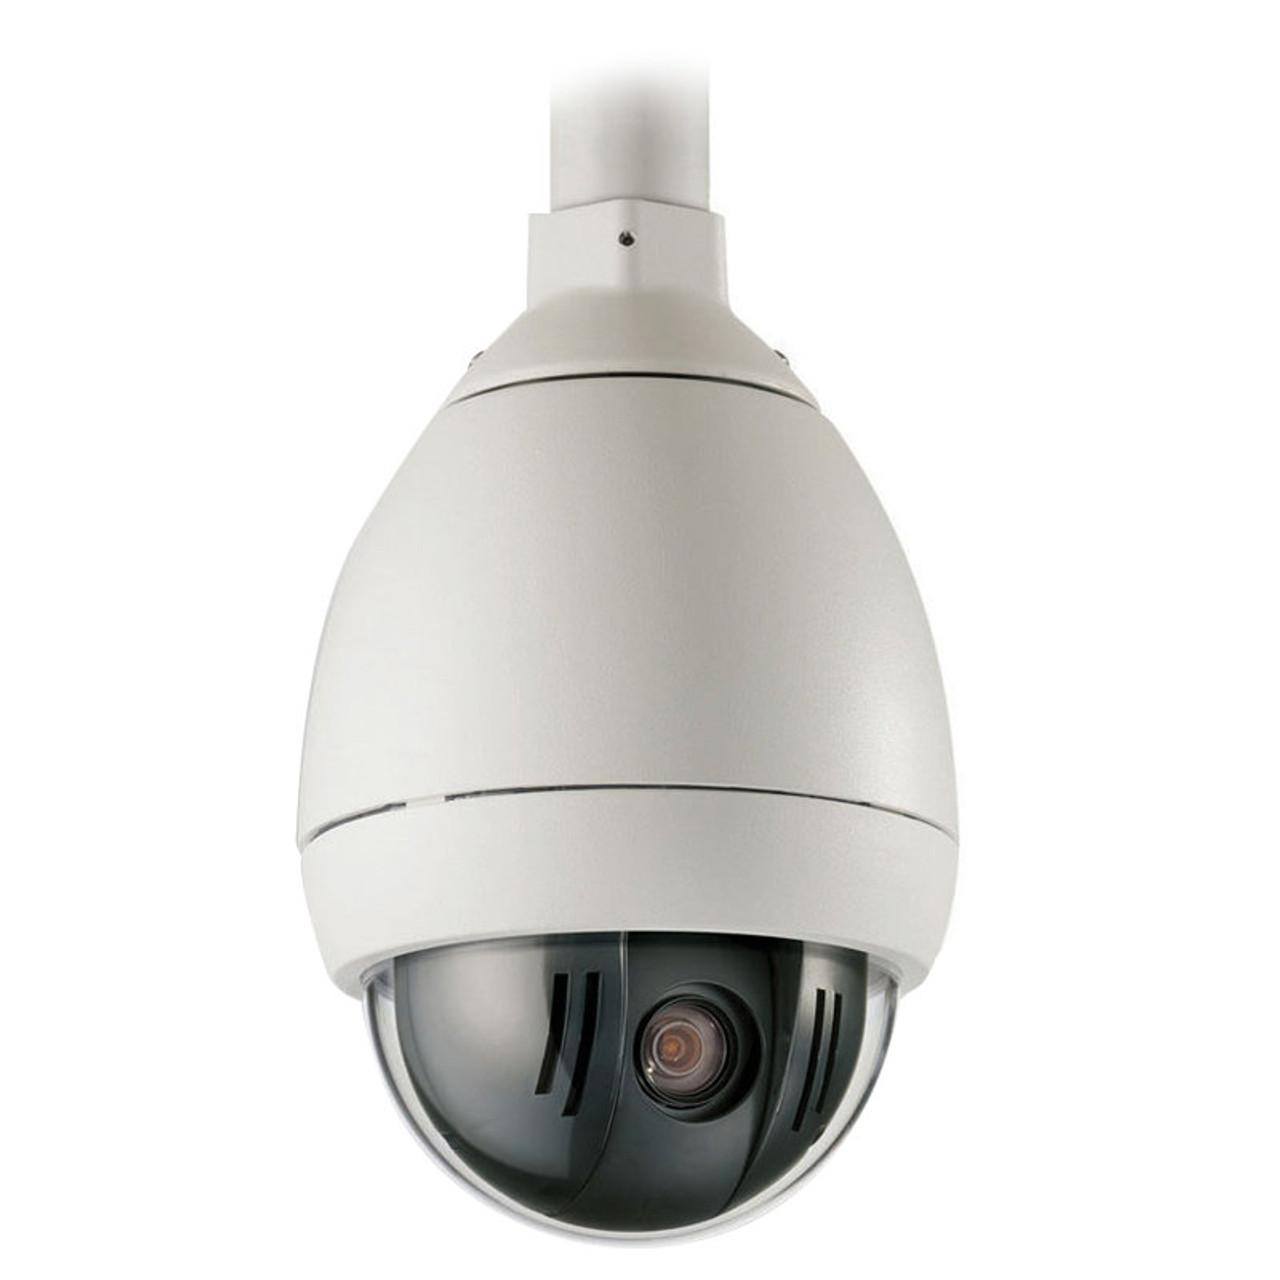 Bosch Vg5 624 Ecs 550tvl Outdoor Ptz Cctv Analog Security Camera